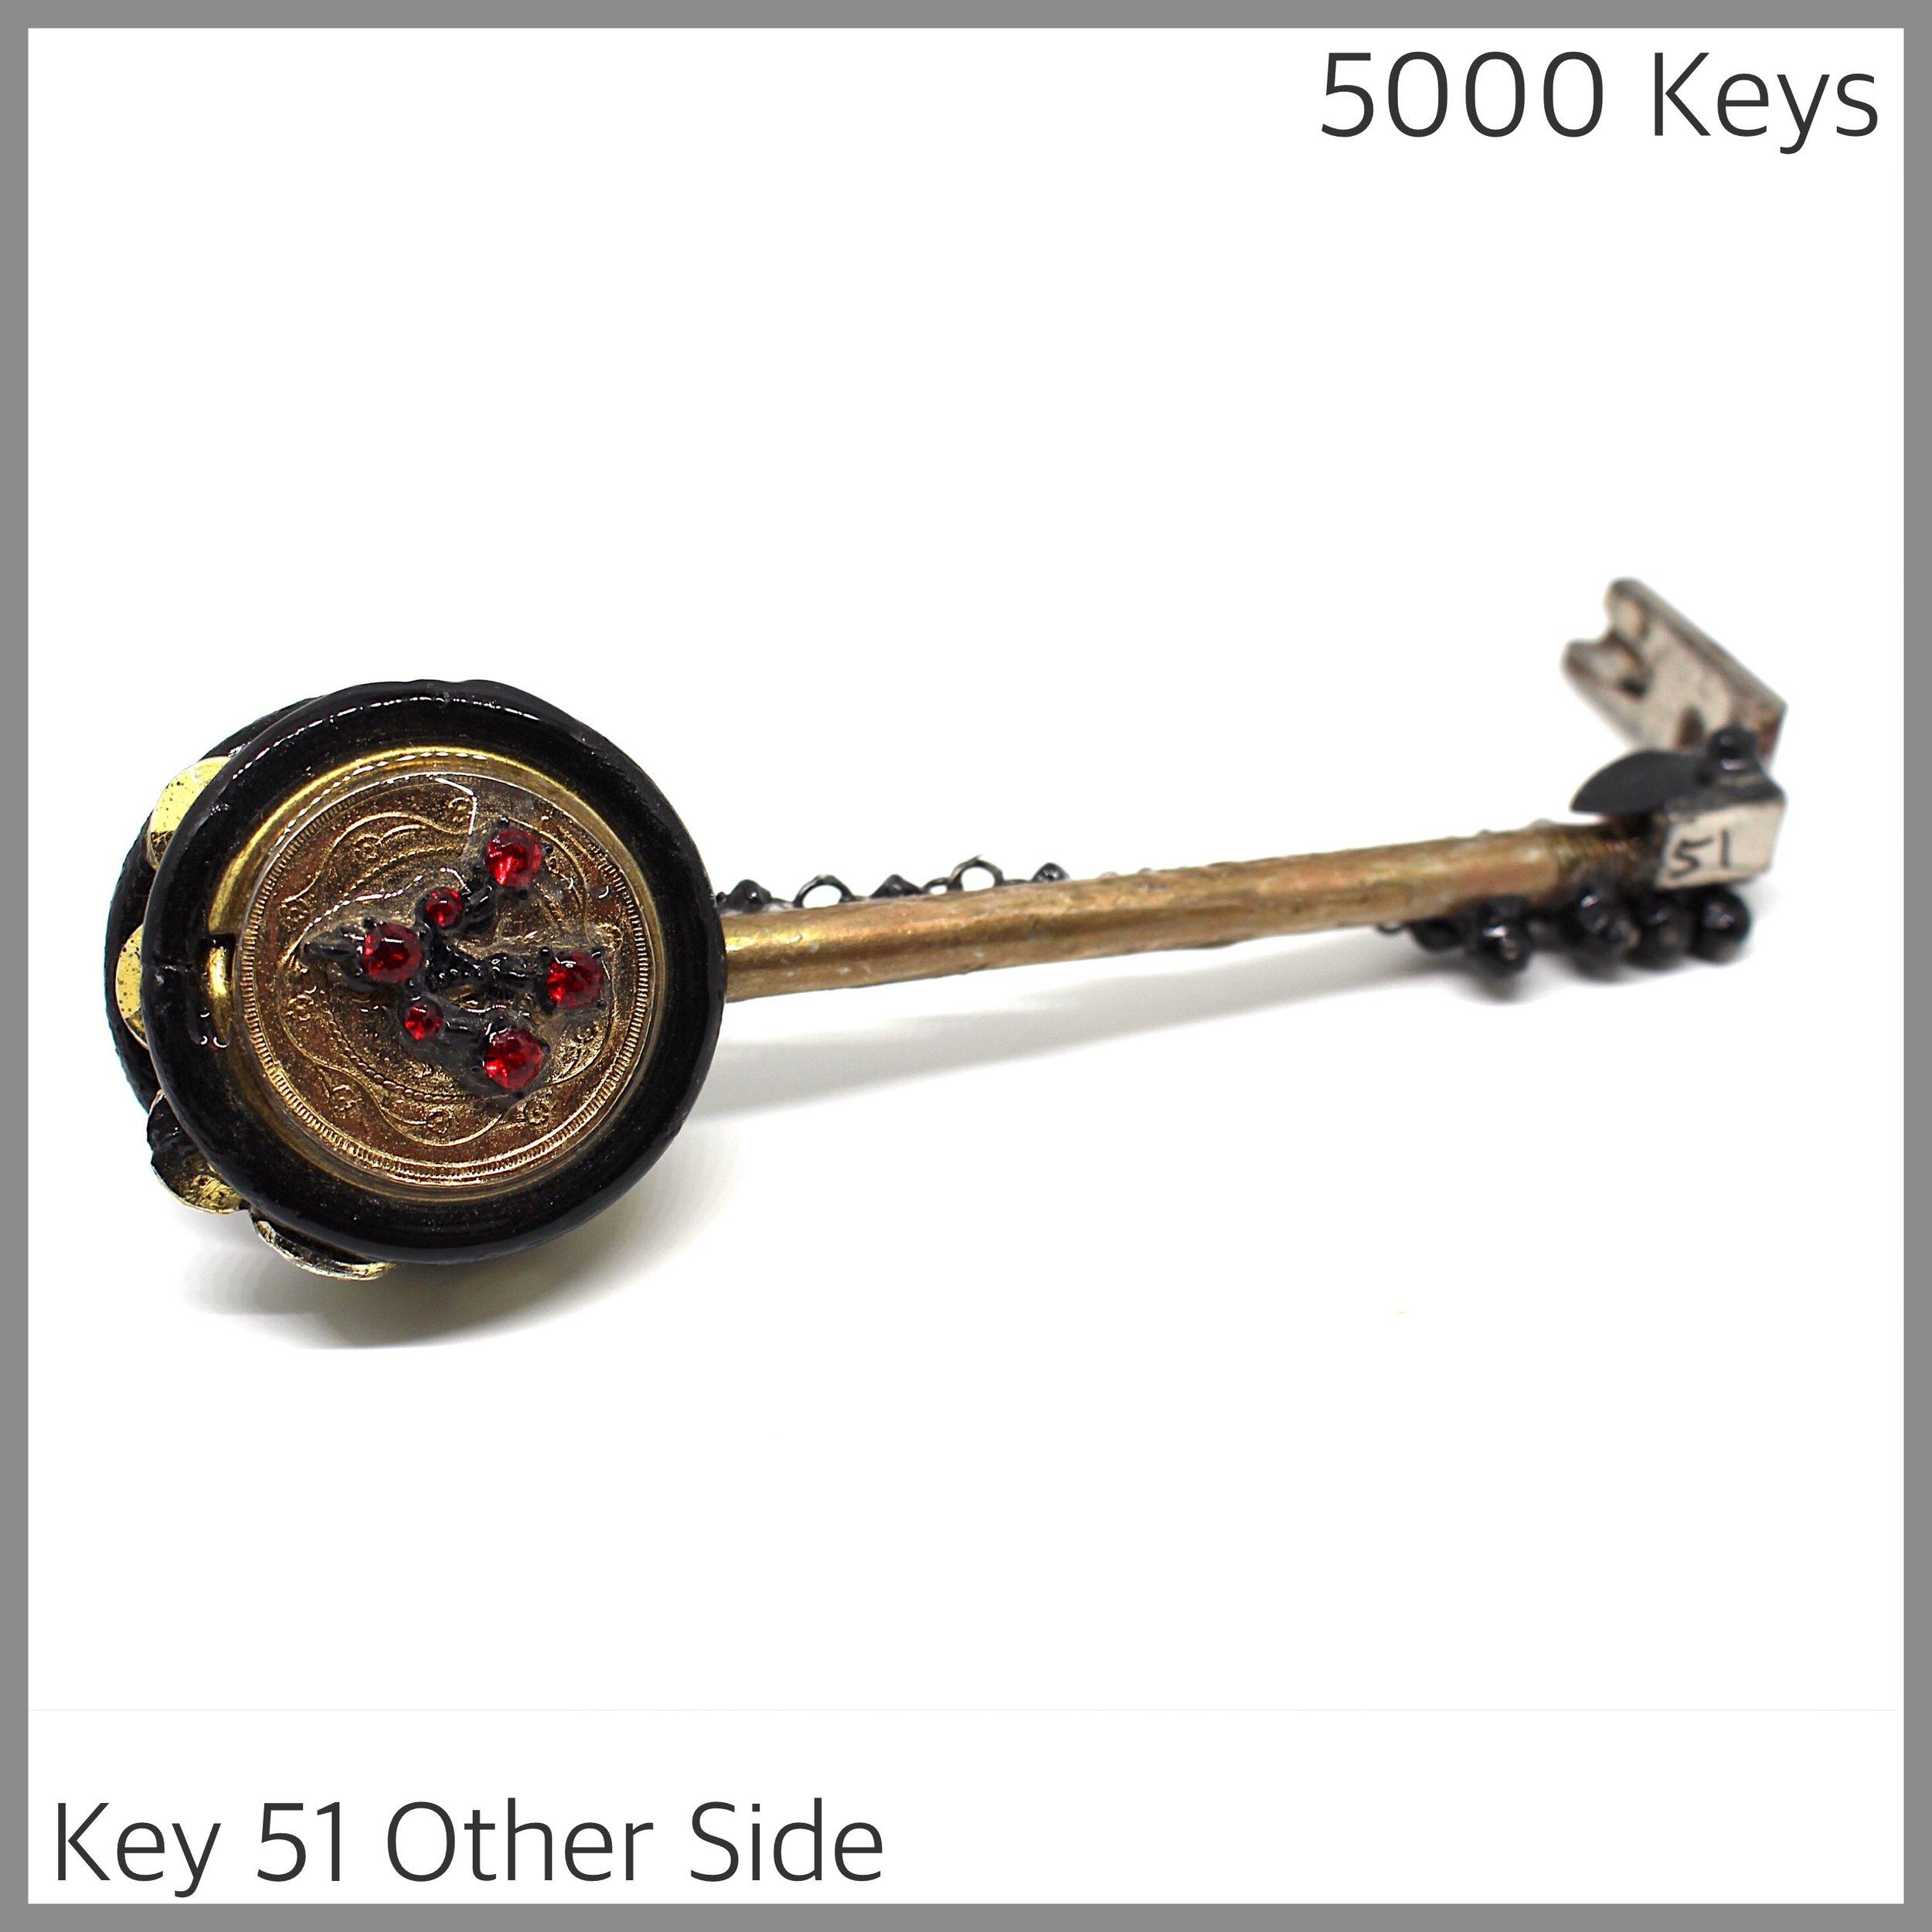 Key 51 other side 1.JPG